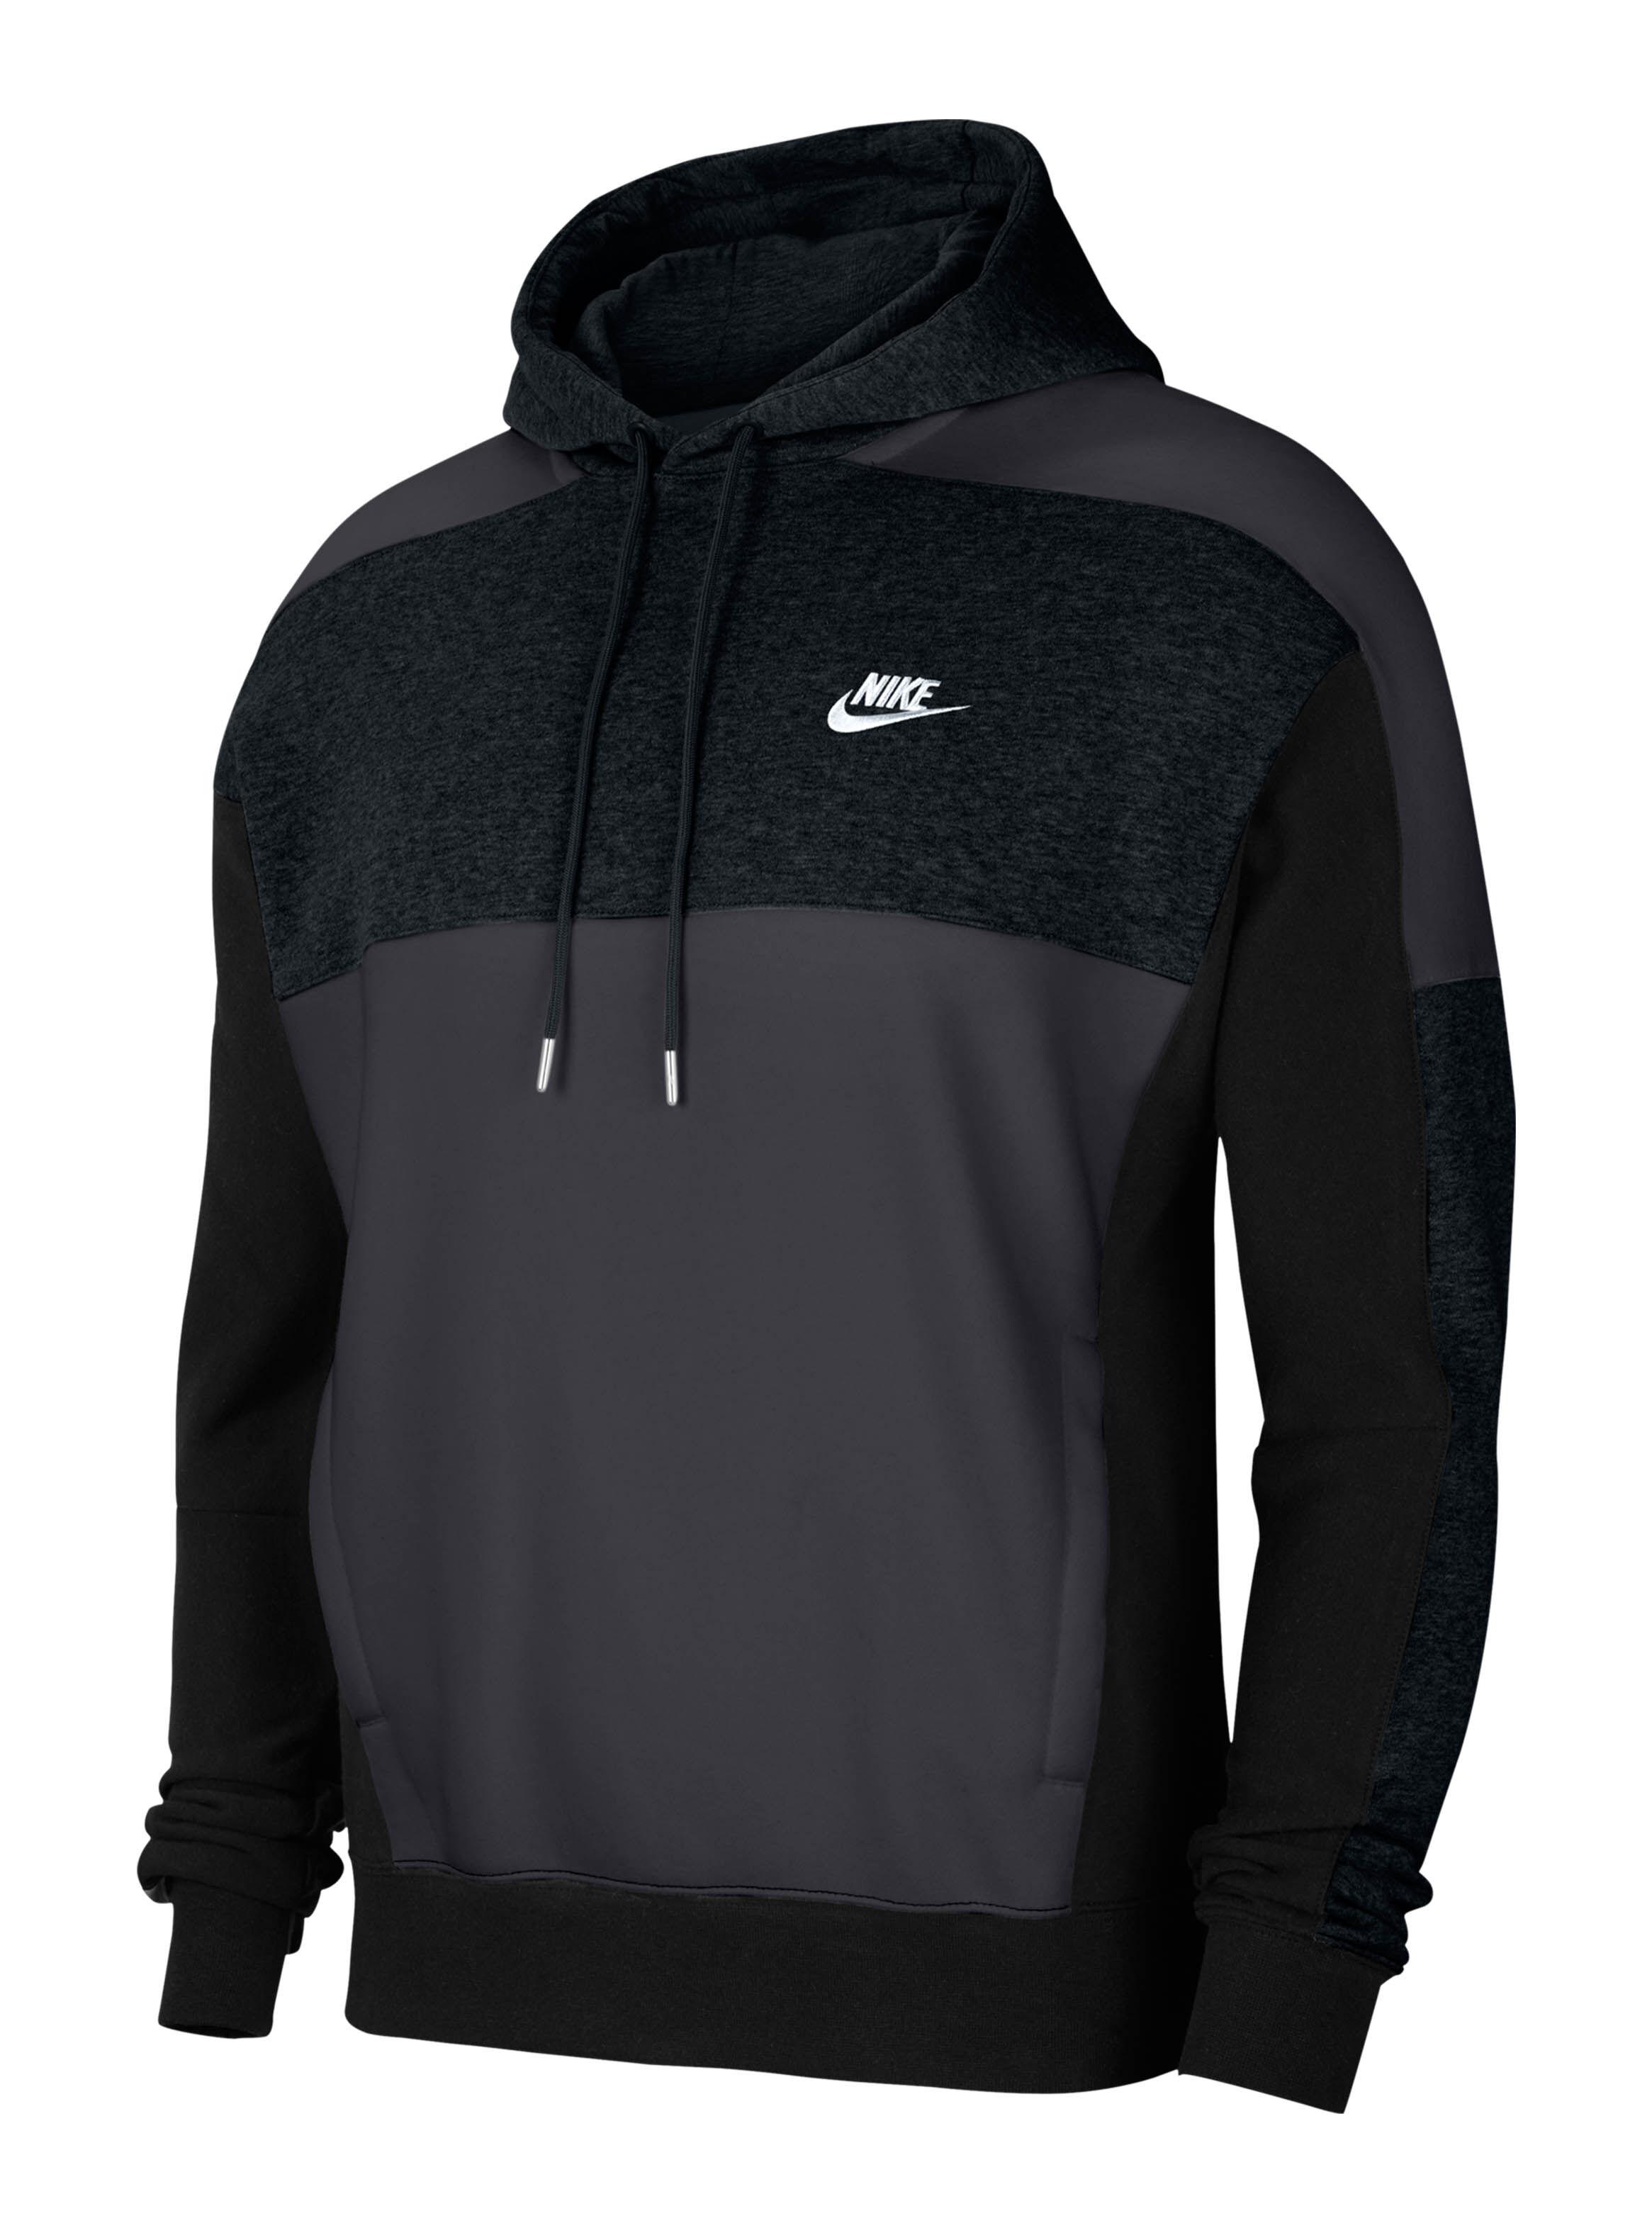 Polerón Nike Sportswear Clubcon Capucha Hombre